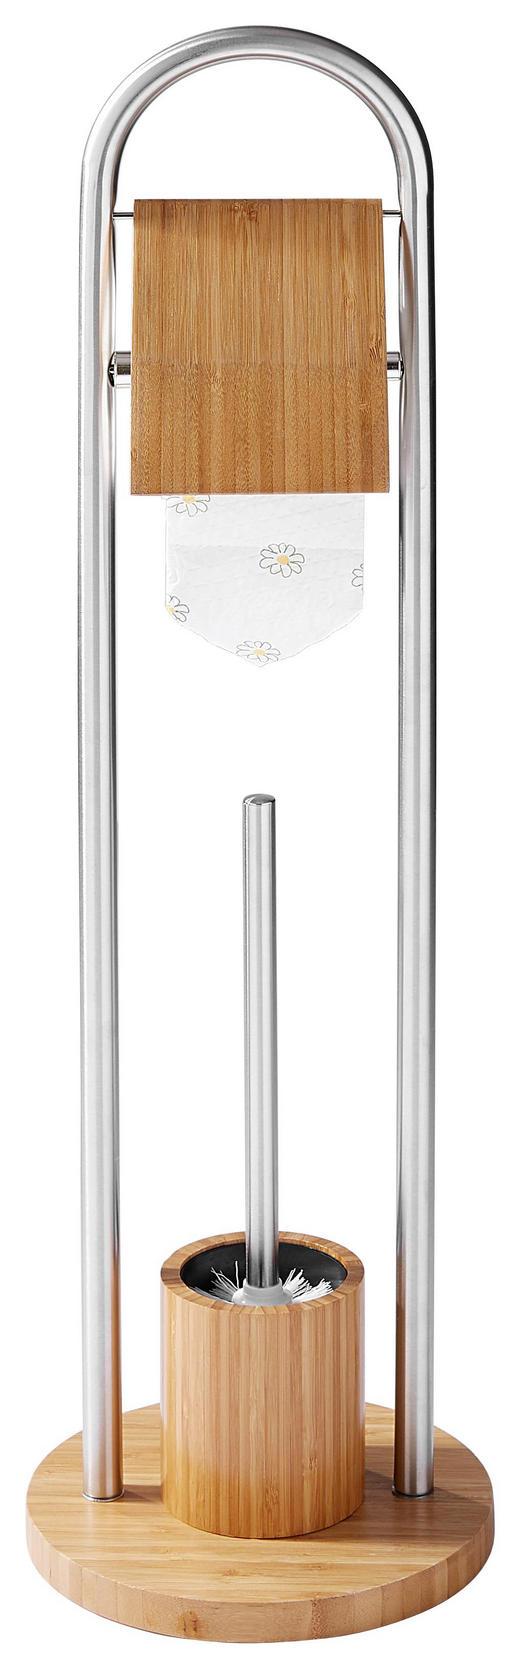 WC-BÜRSTENGARNITUR - Holz/Metall (80cm)